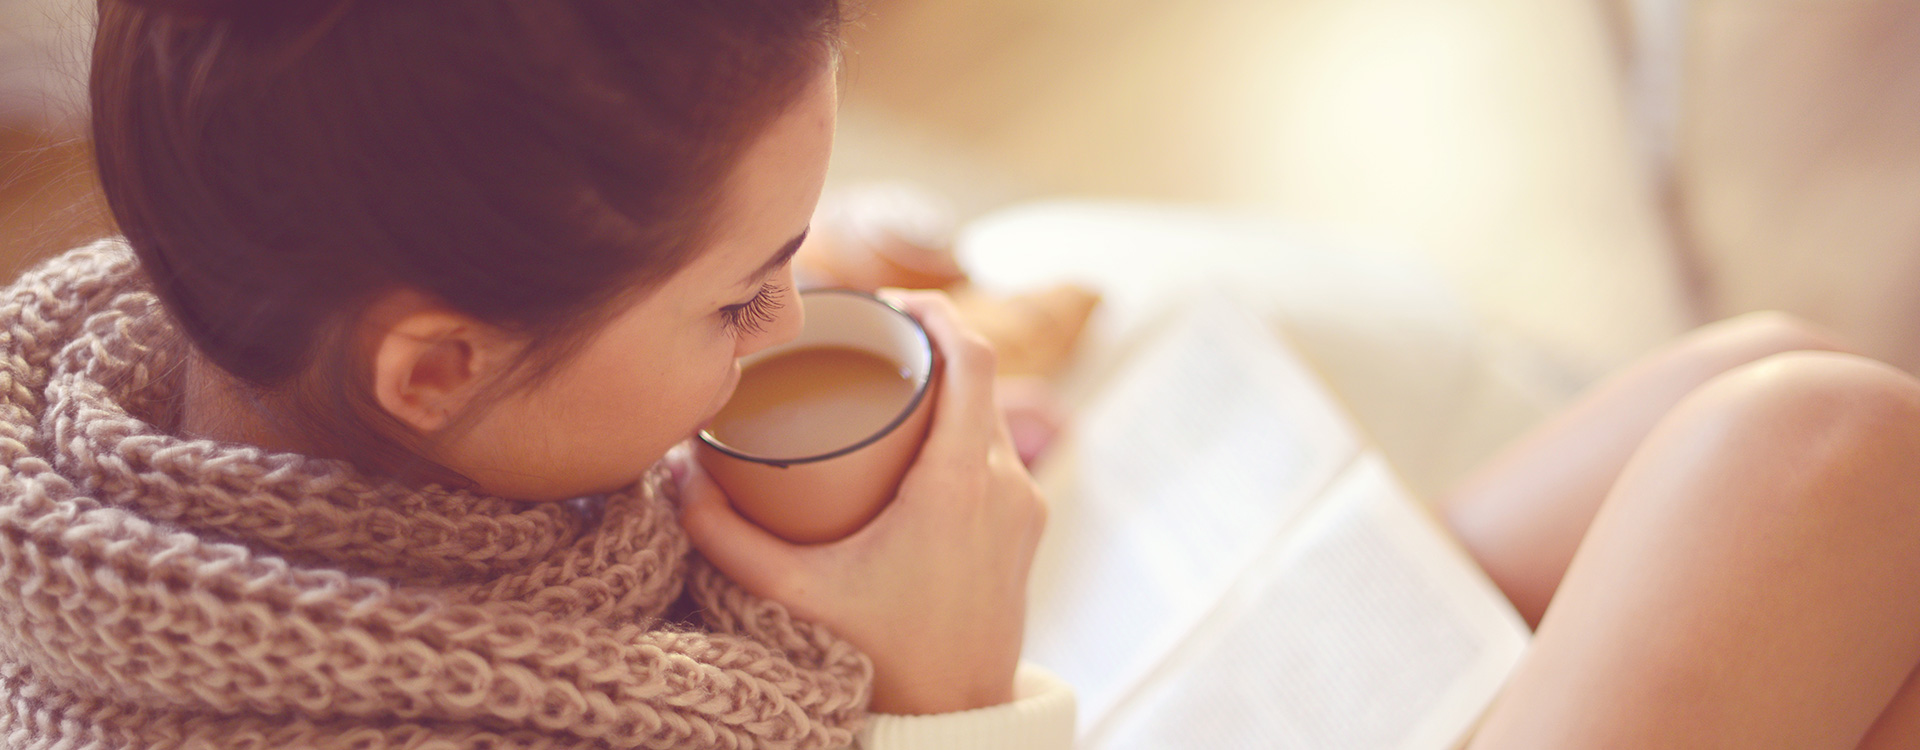 Behandlung von Erkältungen: Den Körper unterstützen